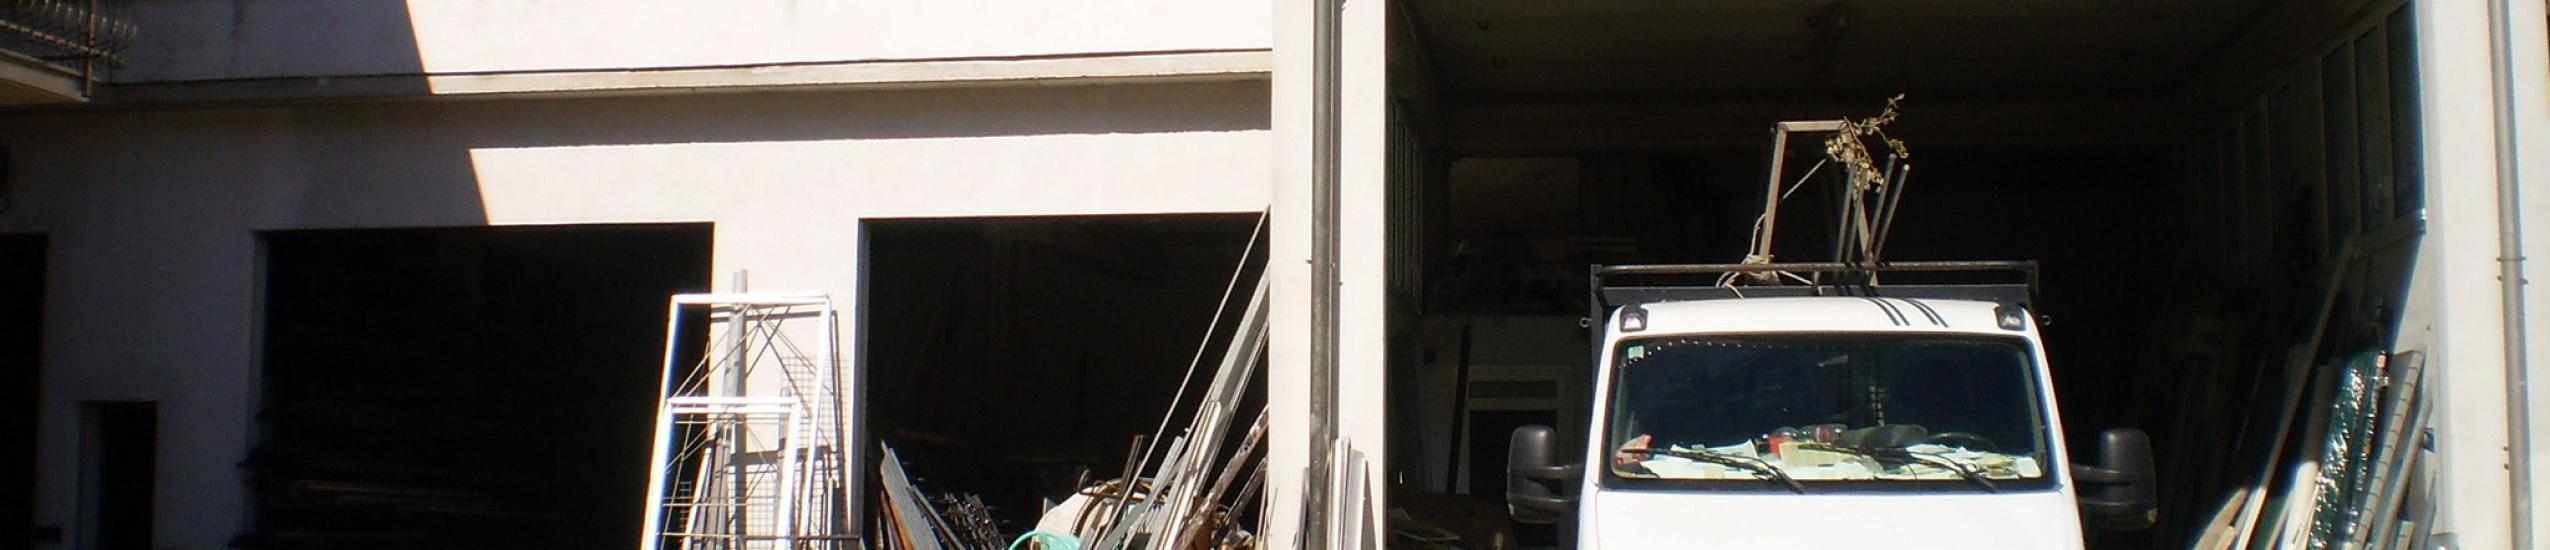 Carpenteria metallica di Massa Giambattista Valter